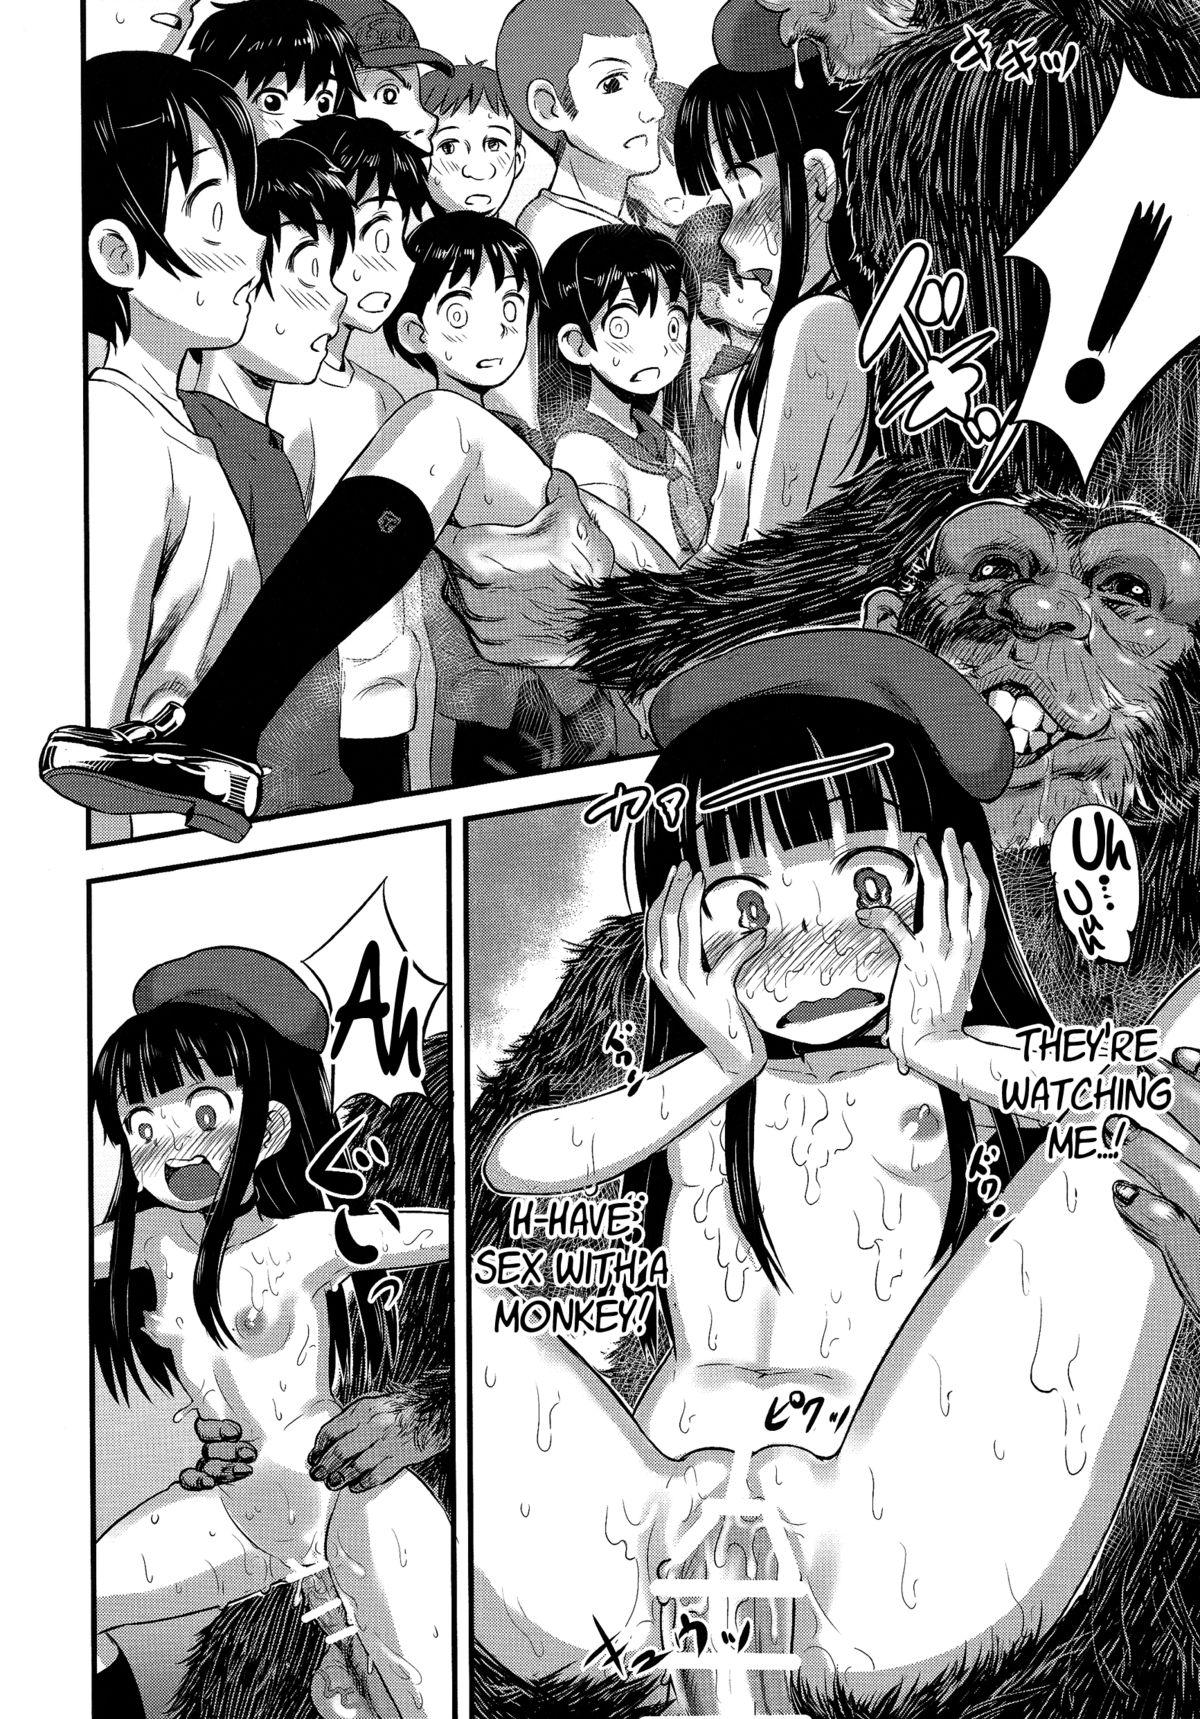 Hadakahime Honoka 2 Misemono Tanetsuke Saru Koubi | Naked Princess Honoka 2 - Mating Exhibition: Monkey Coitus 22